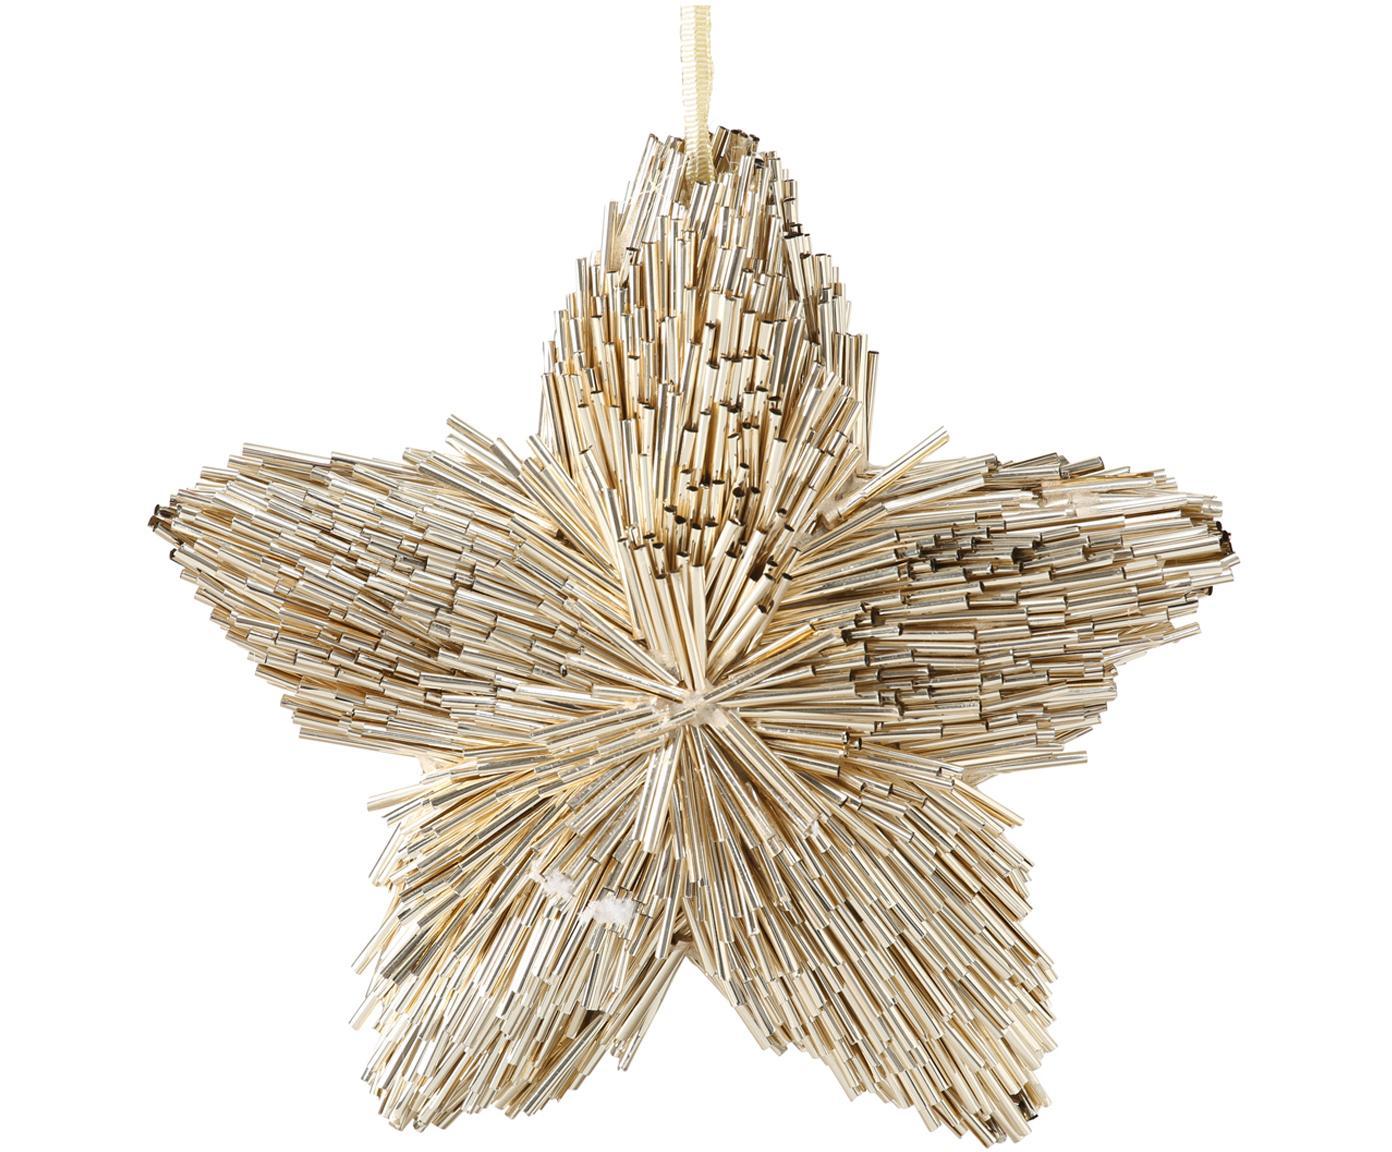 Decoratieve hangers Callum, 2 stuks, Goudkleurig, Ø 16 x D 4 cm